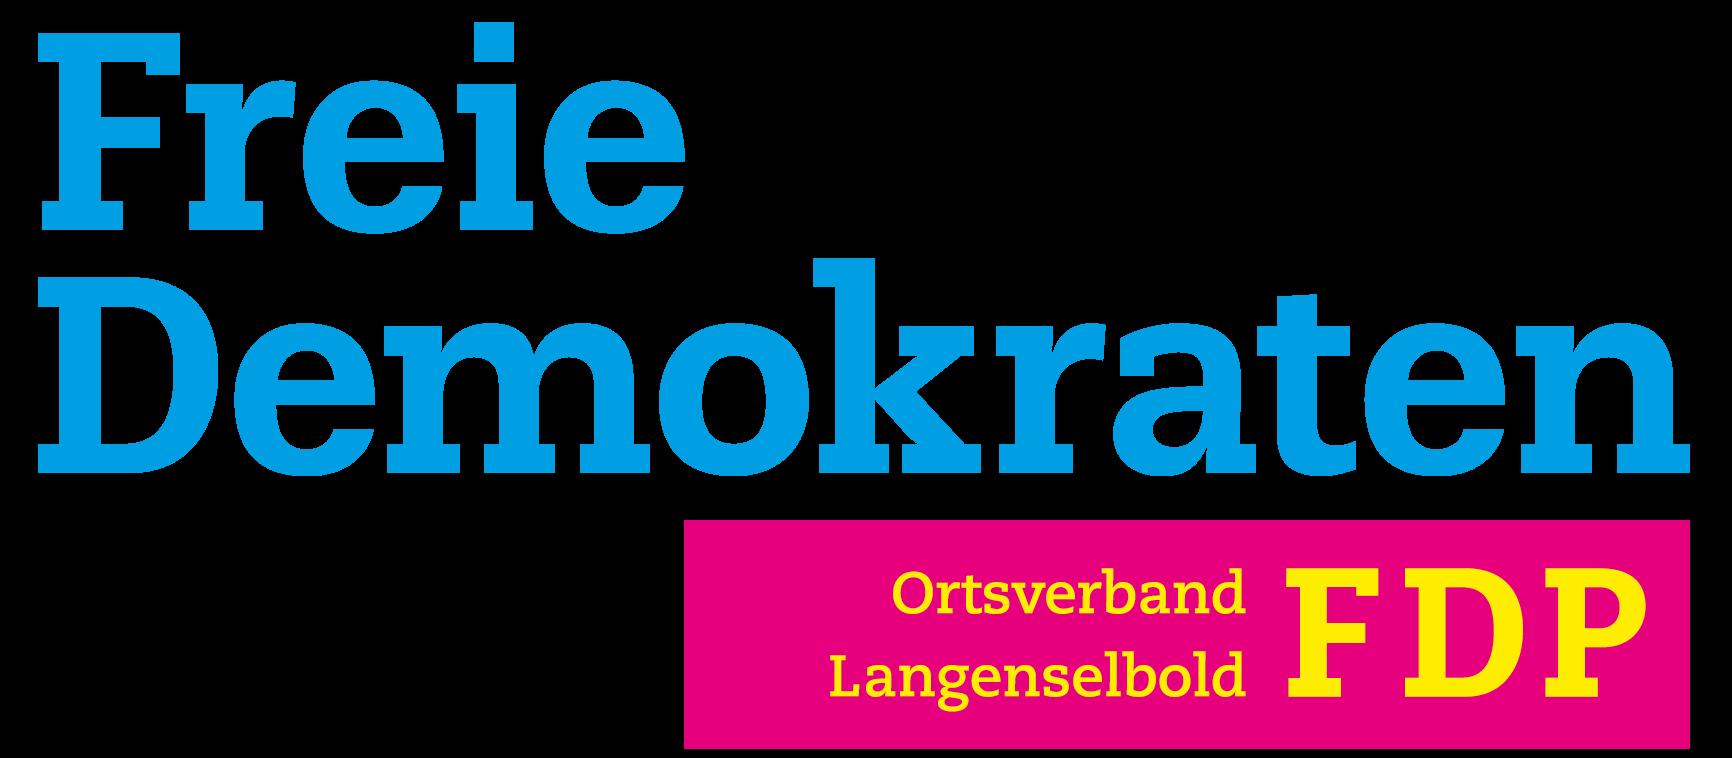 FDP Langenselbold